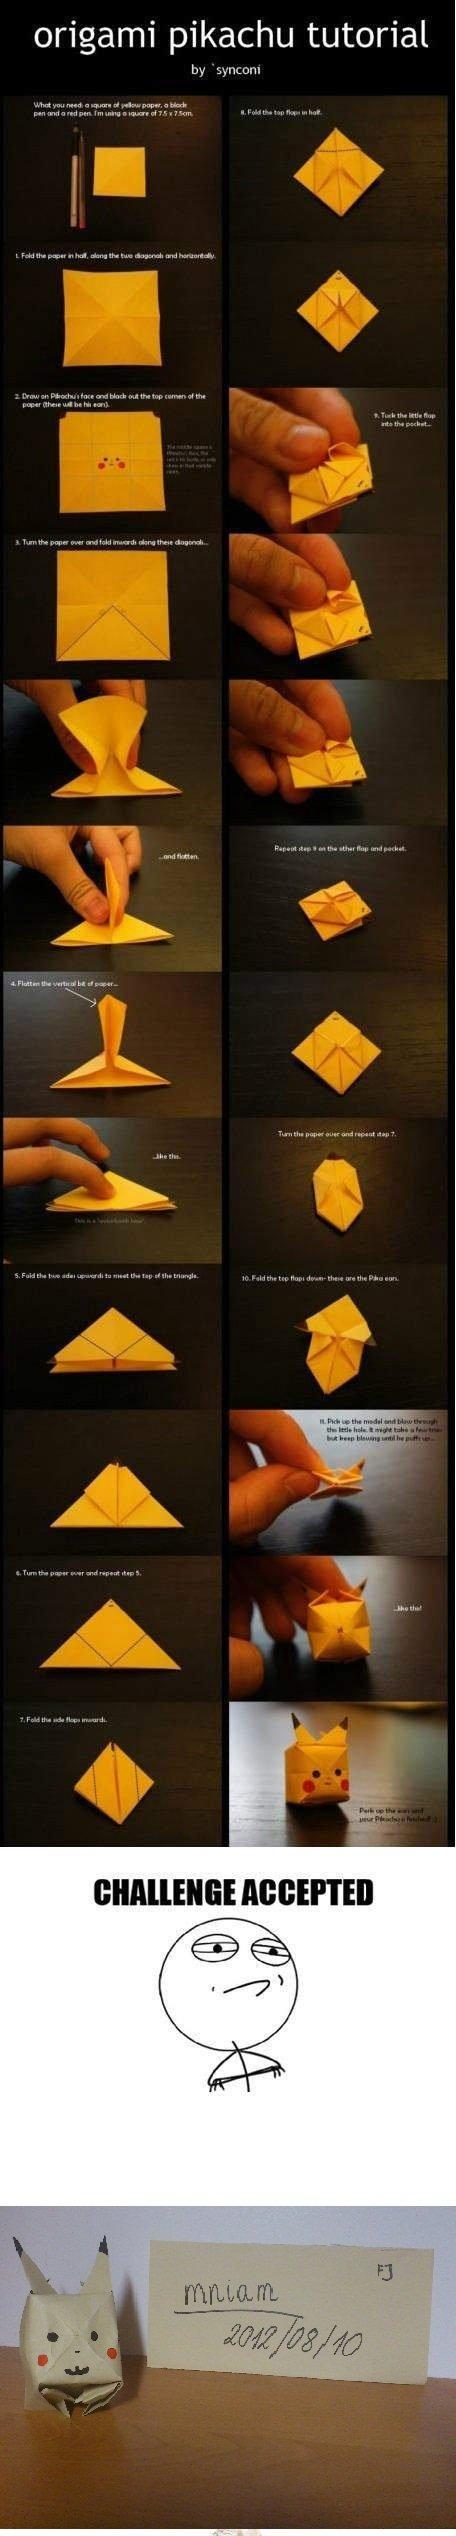 I tried.. OC as you see. origami pikachu tutorial. Close enough Origami